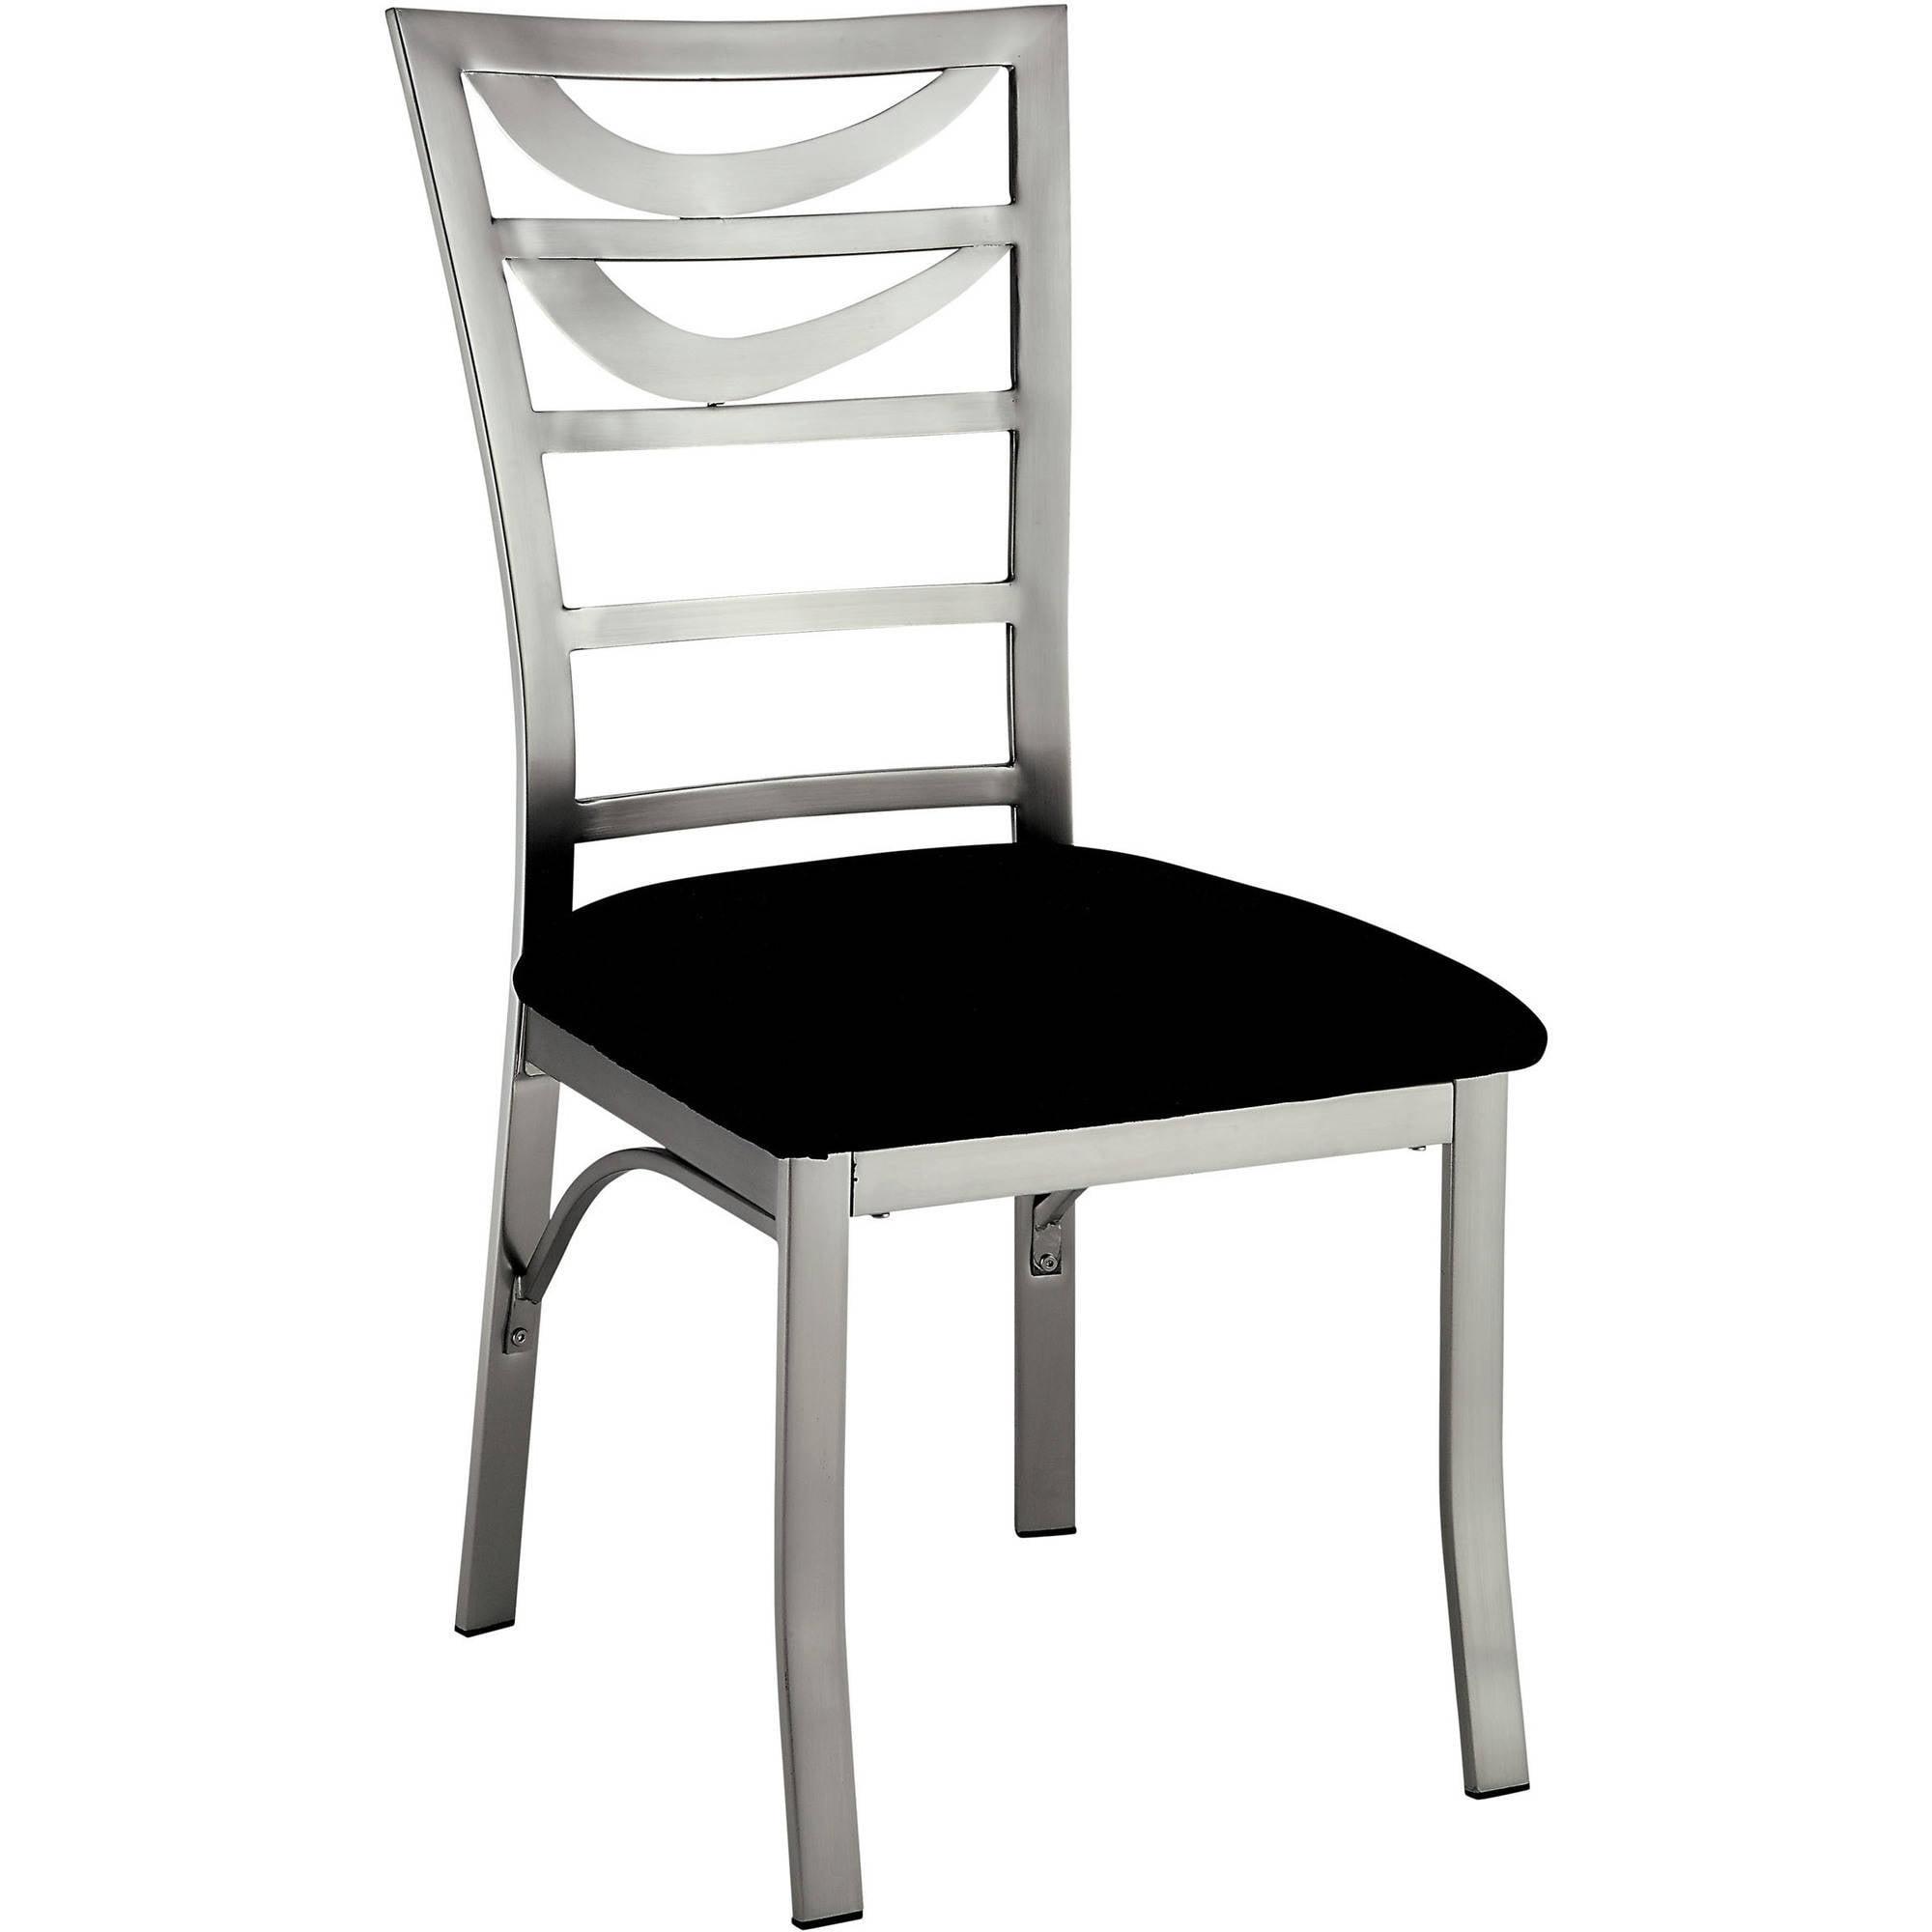 Furniture of America Jacreme Modern Ladder Back Metal Dining Chair, Satin, 2pk by Furniture of America